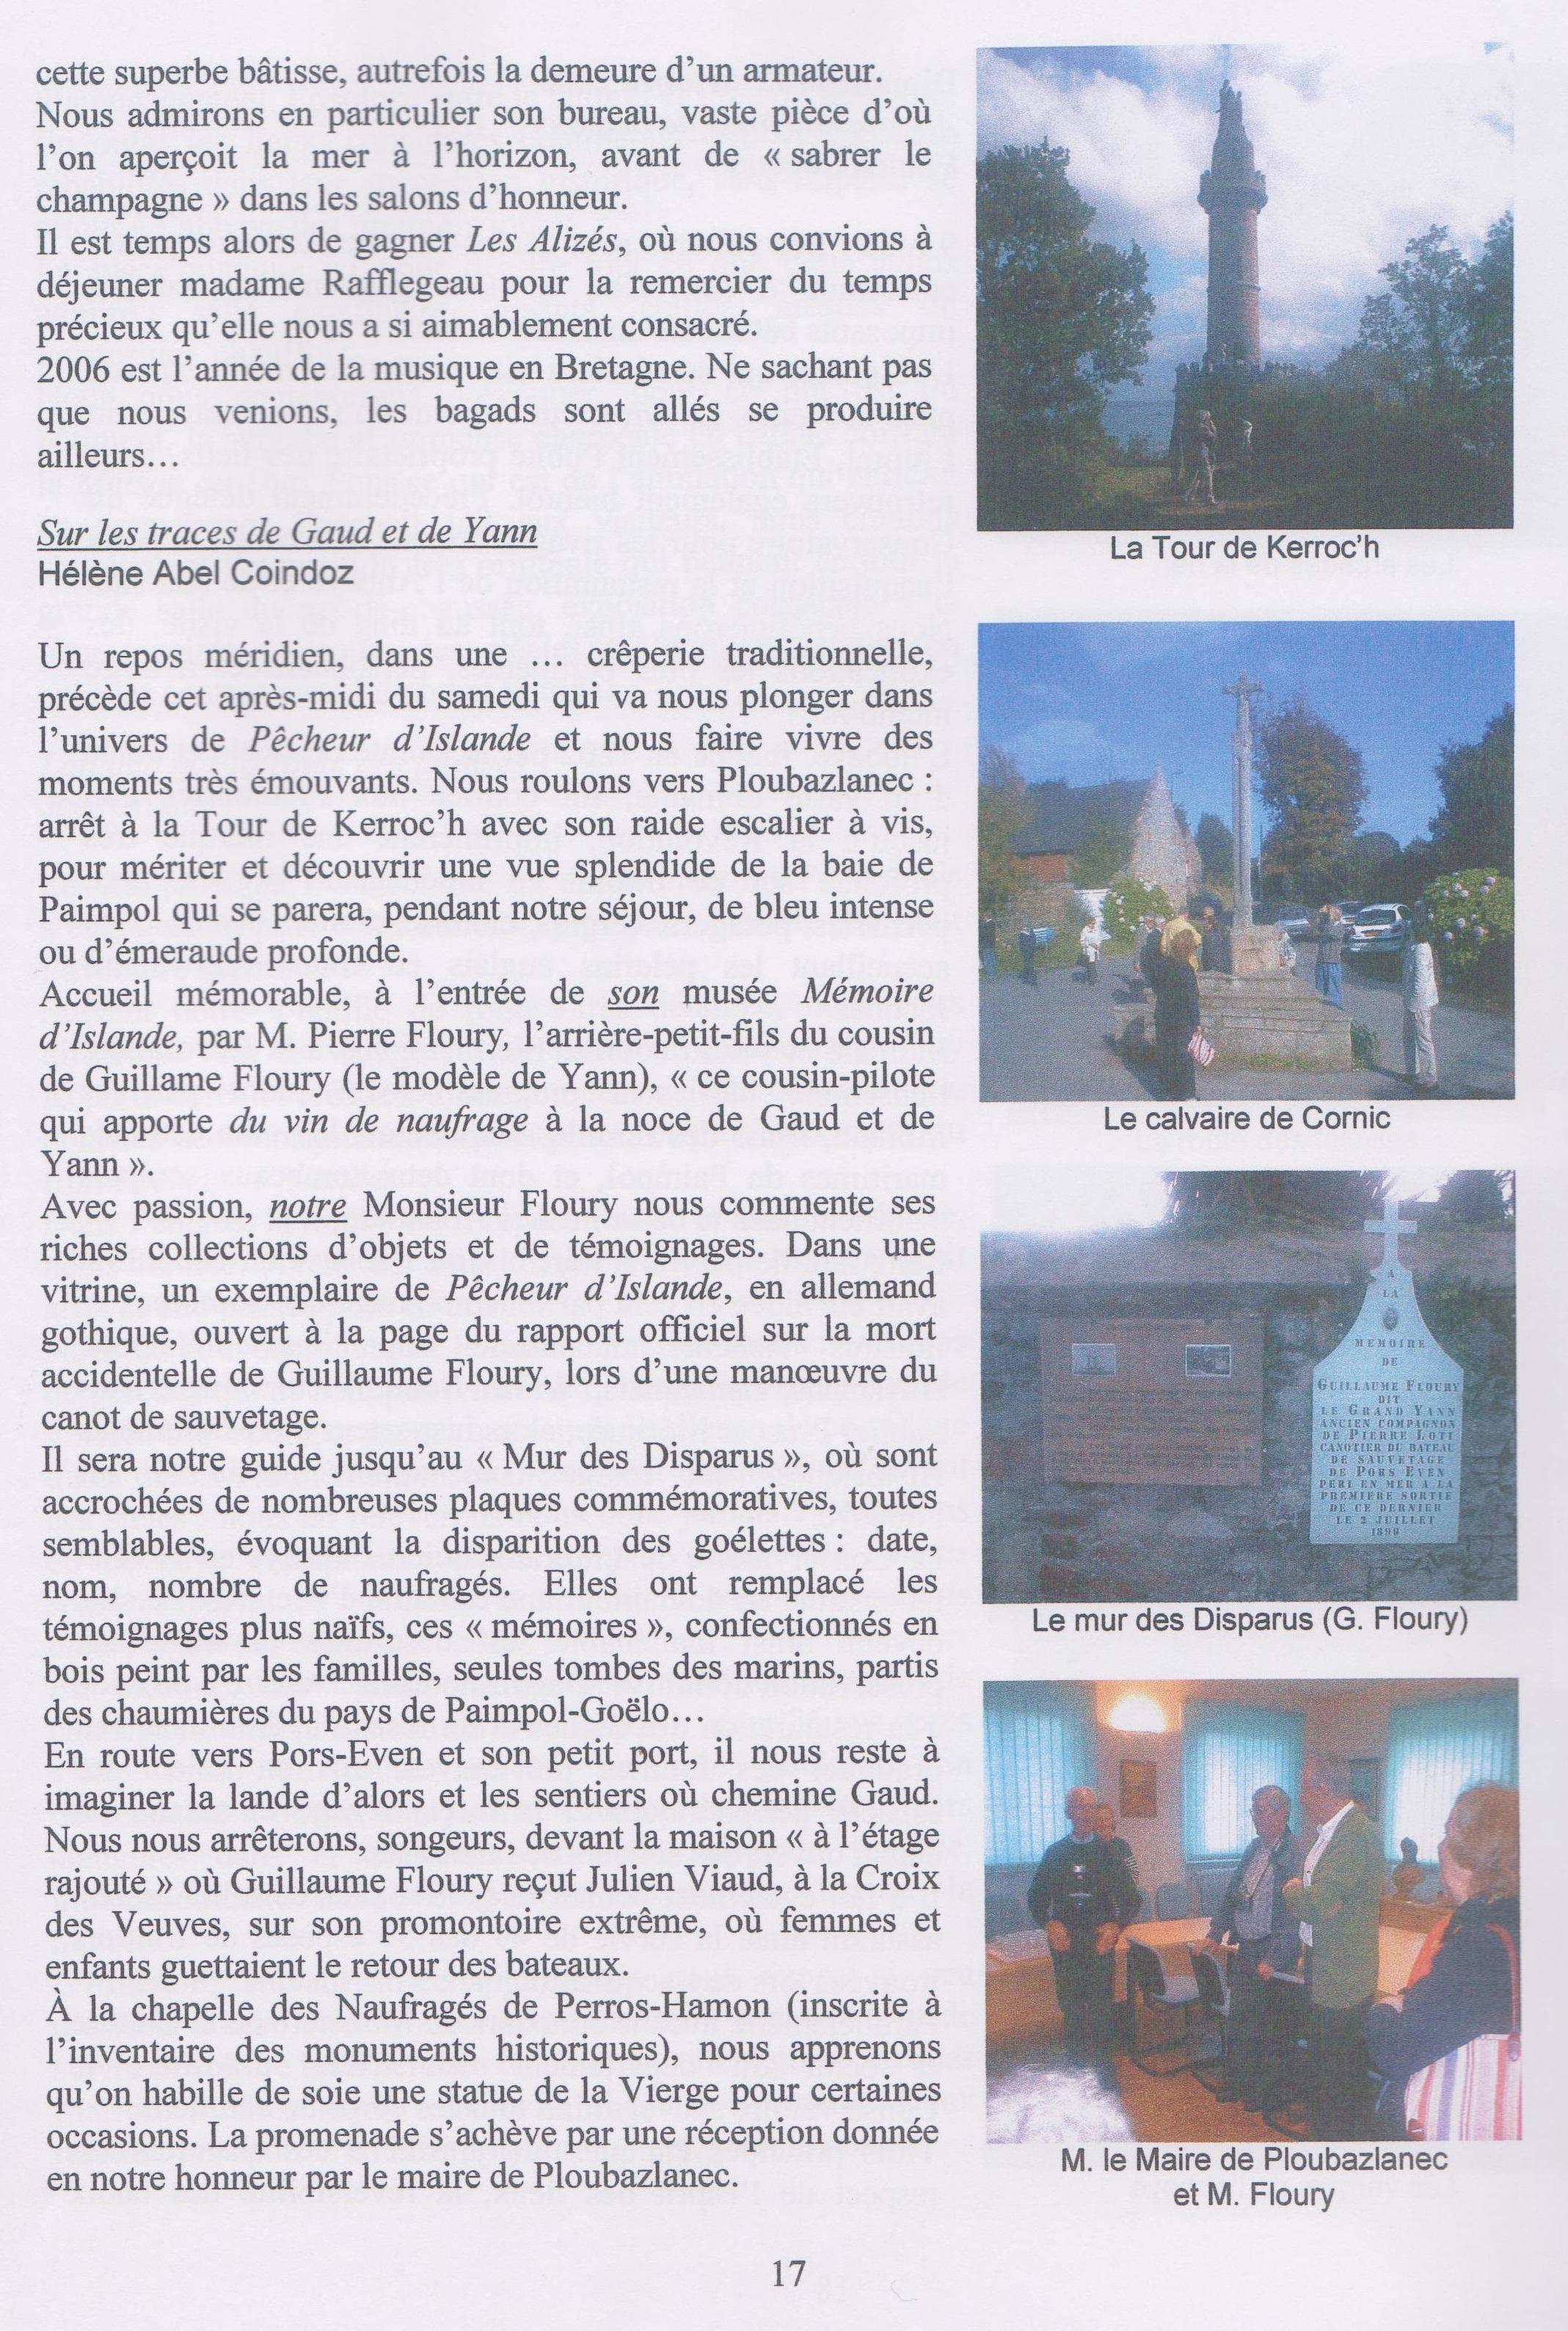 Voyage Paimpol 2006-page 17